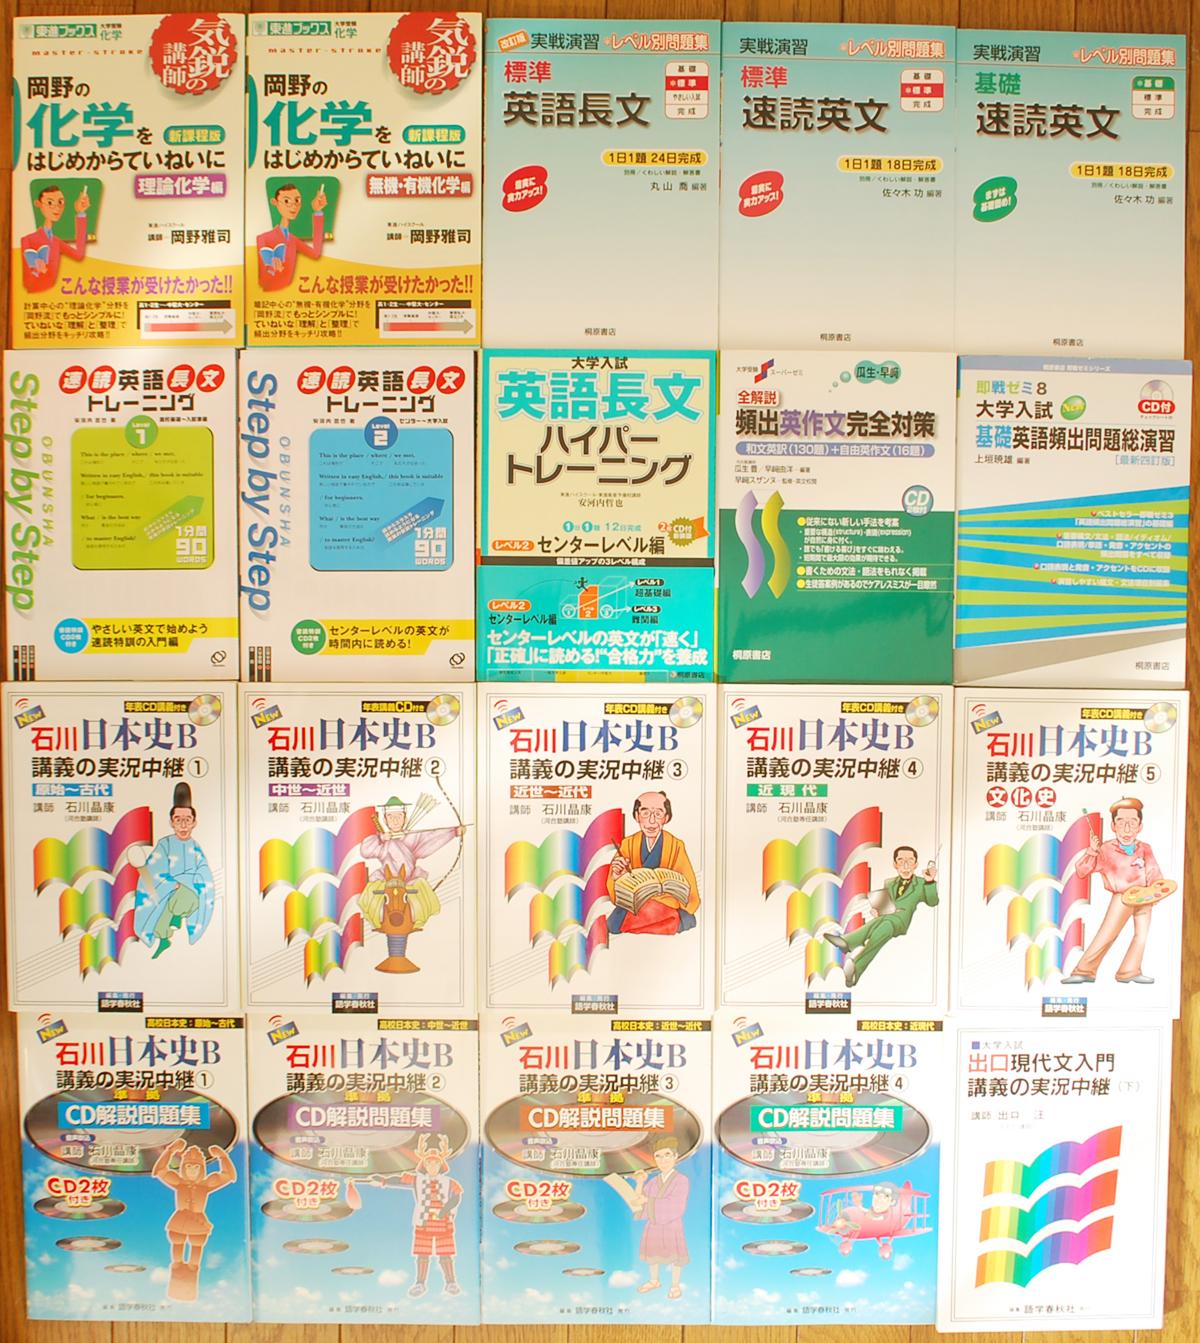 石川日本史B講義の実況中継、速読英語長文トレーニング等大学受験書籍を買取!